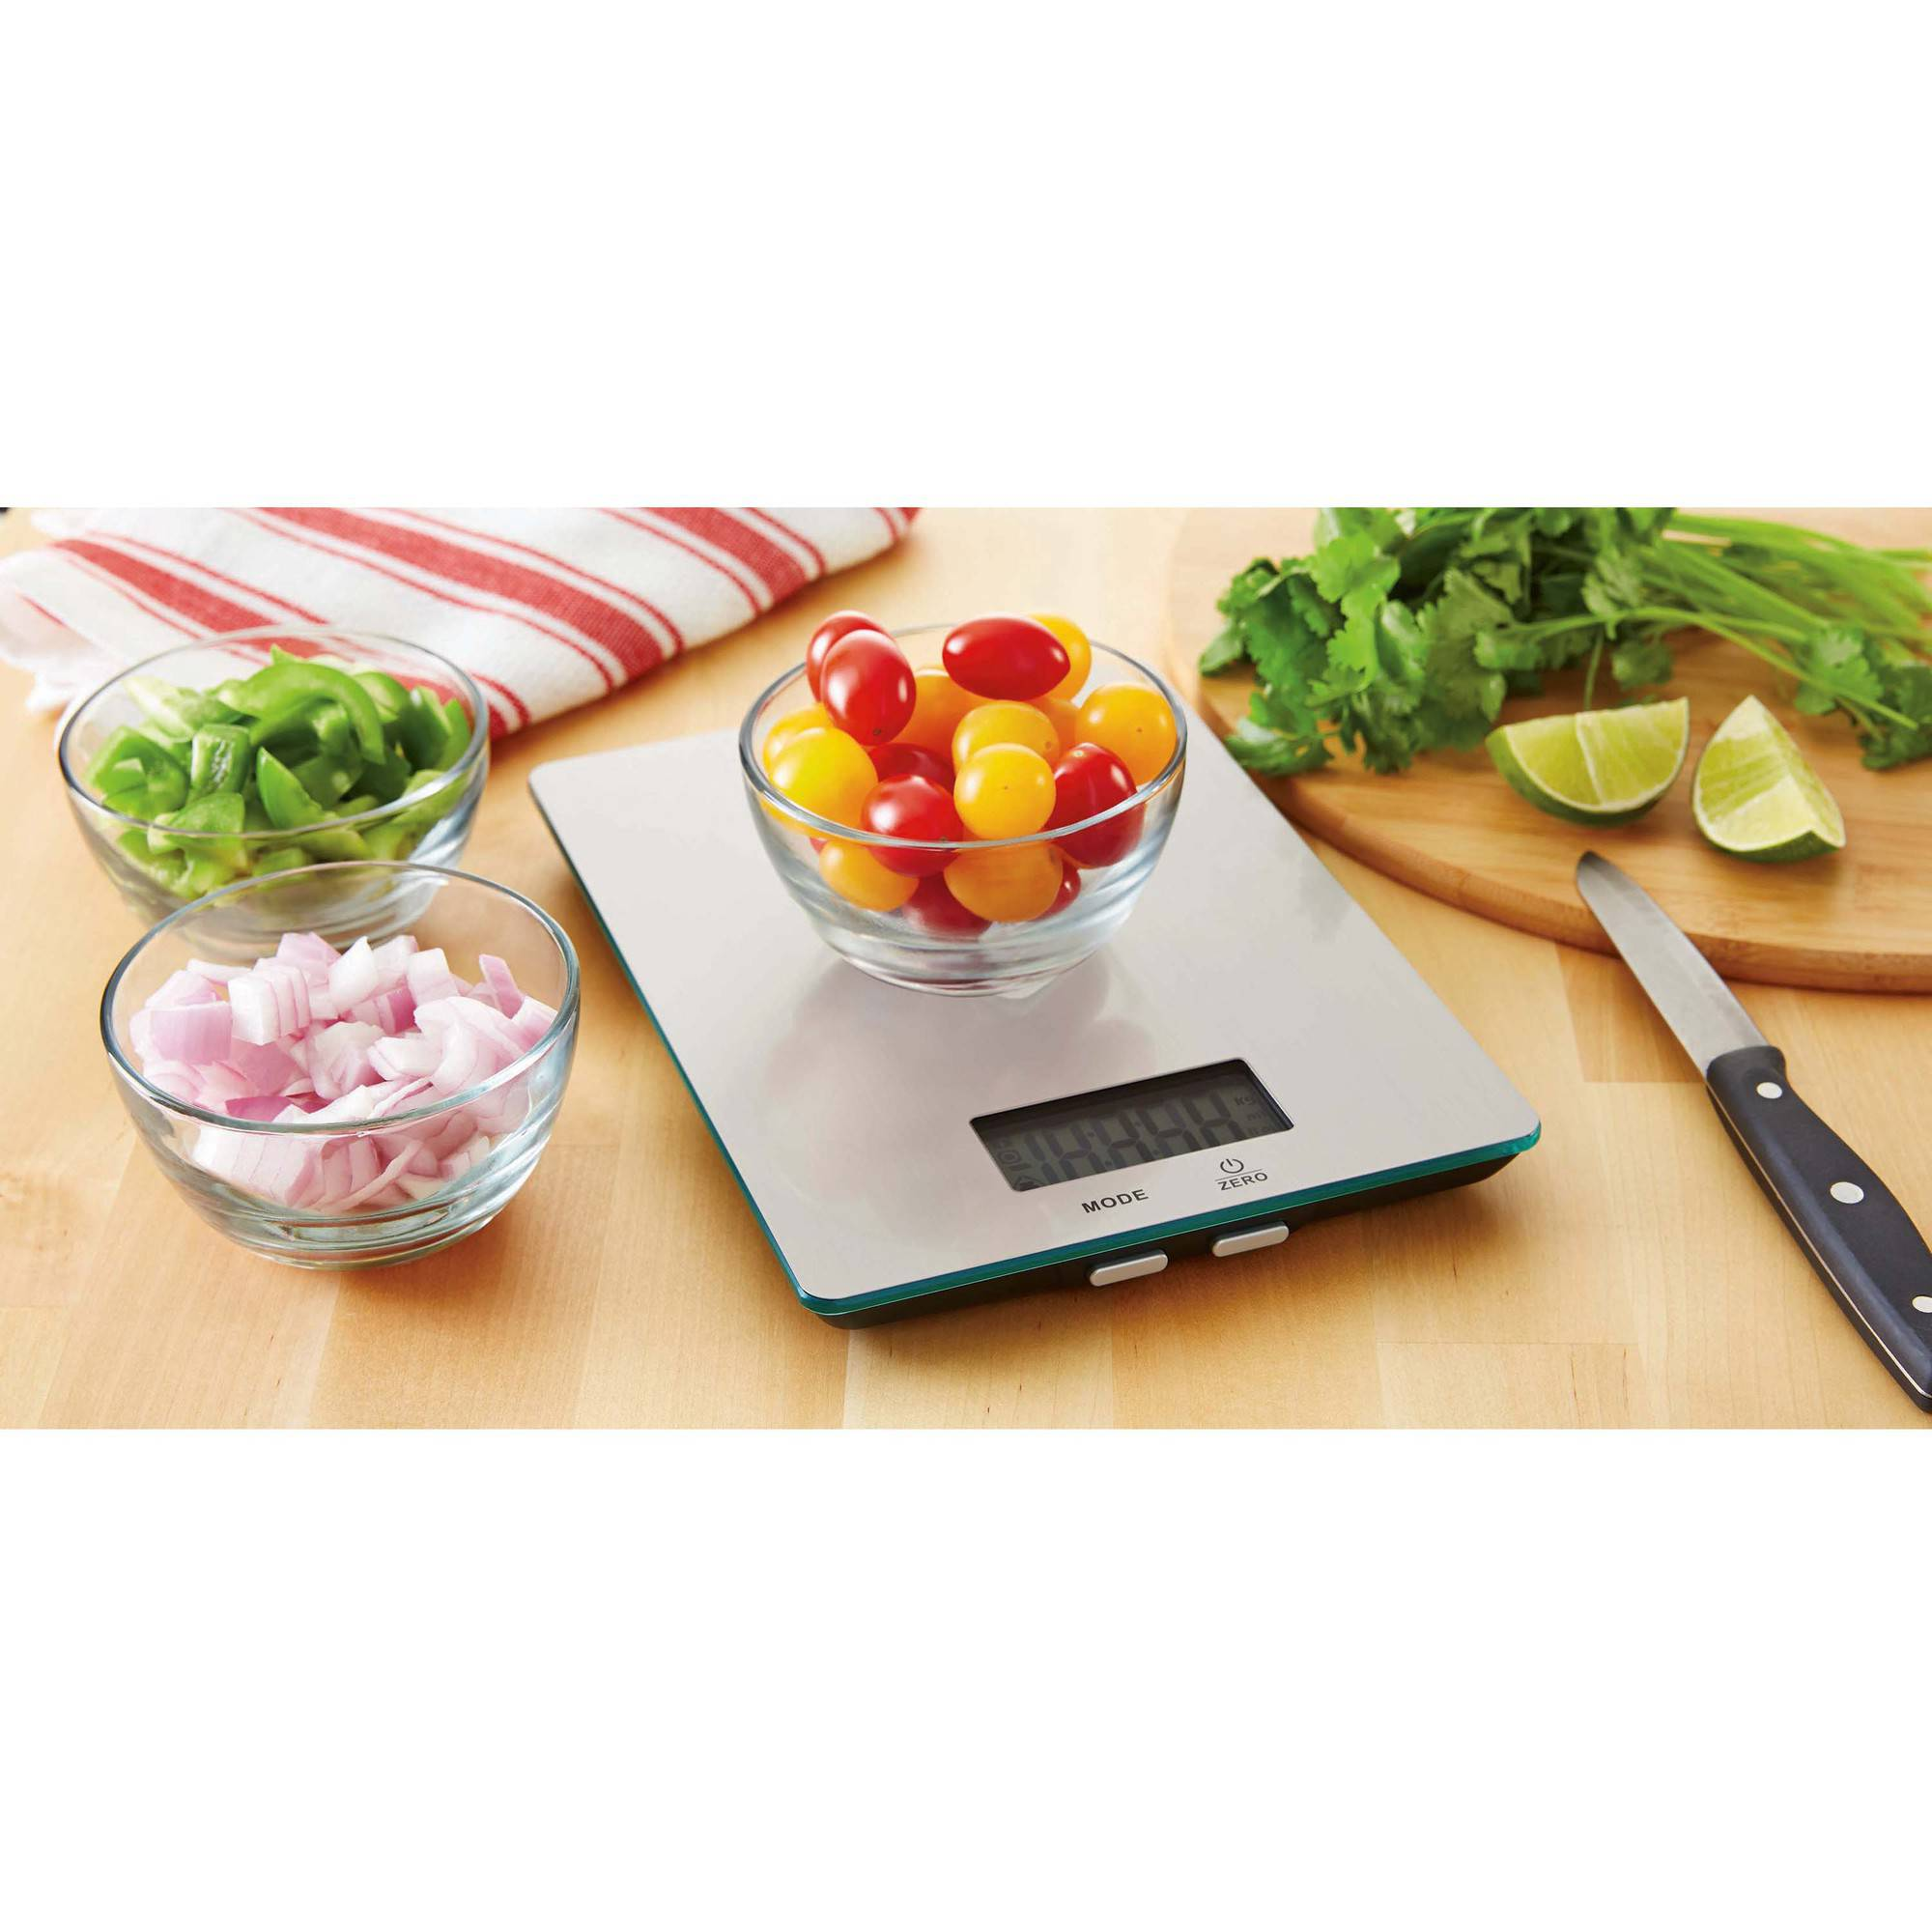 Mainstays Stainless Steel Digital Kitchen Scale